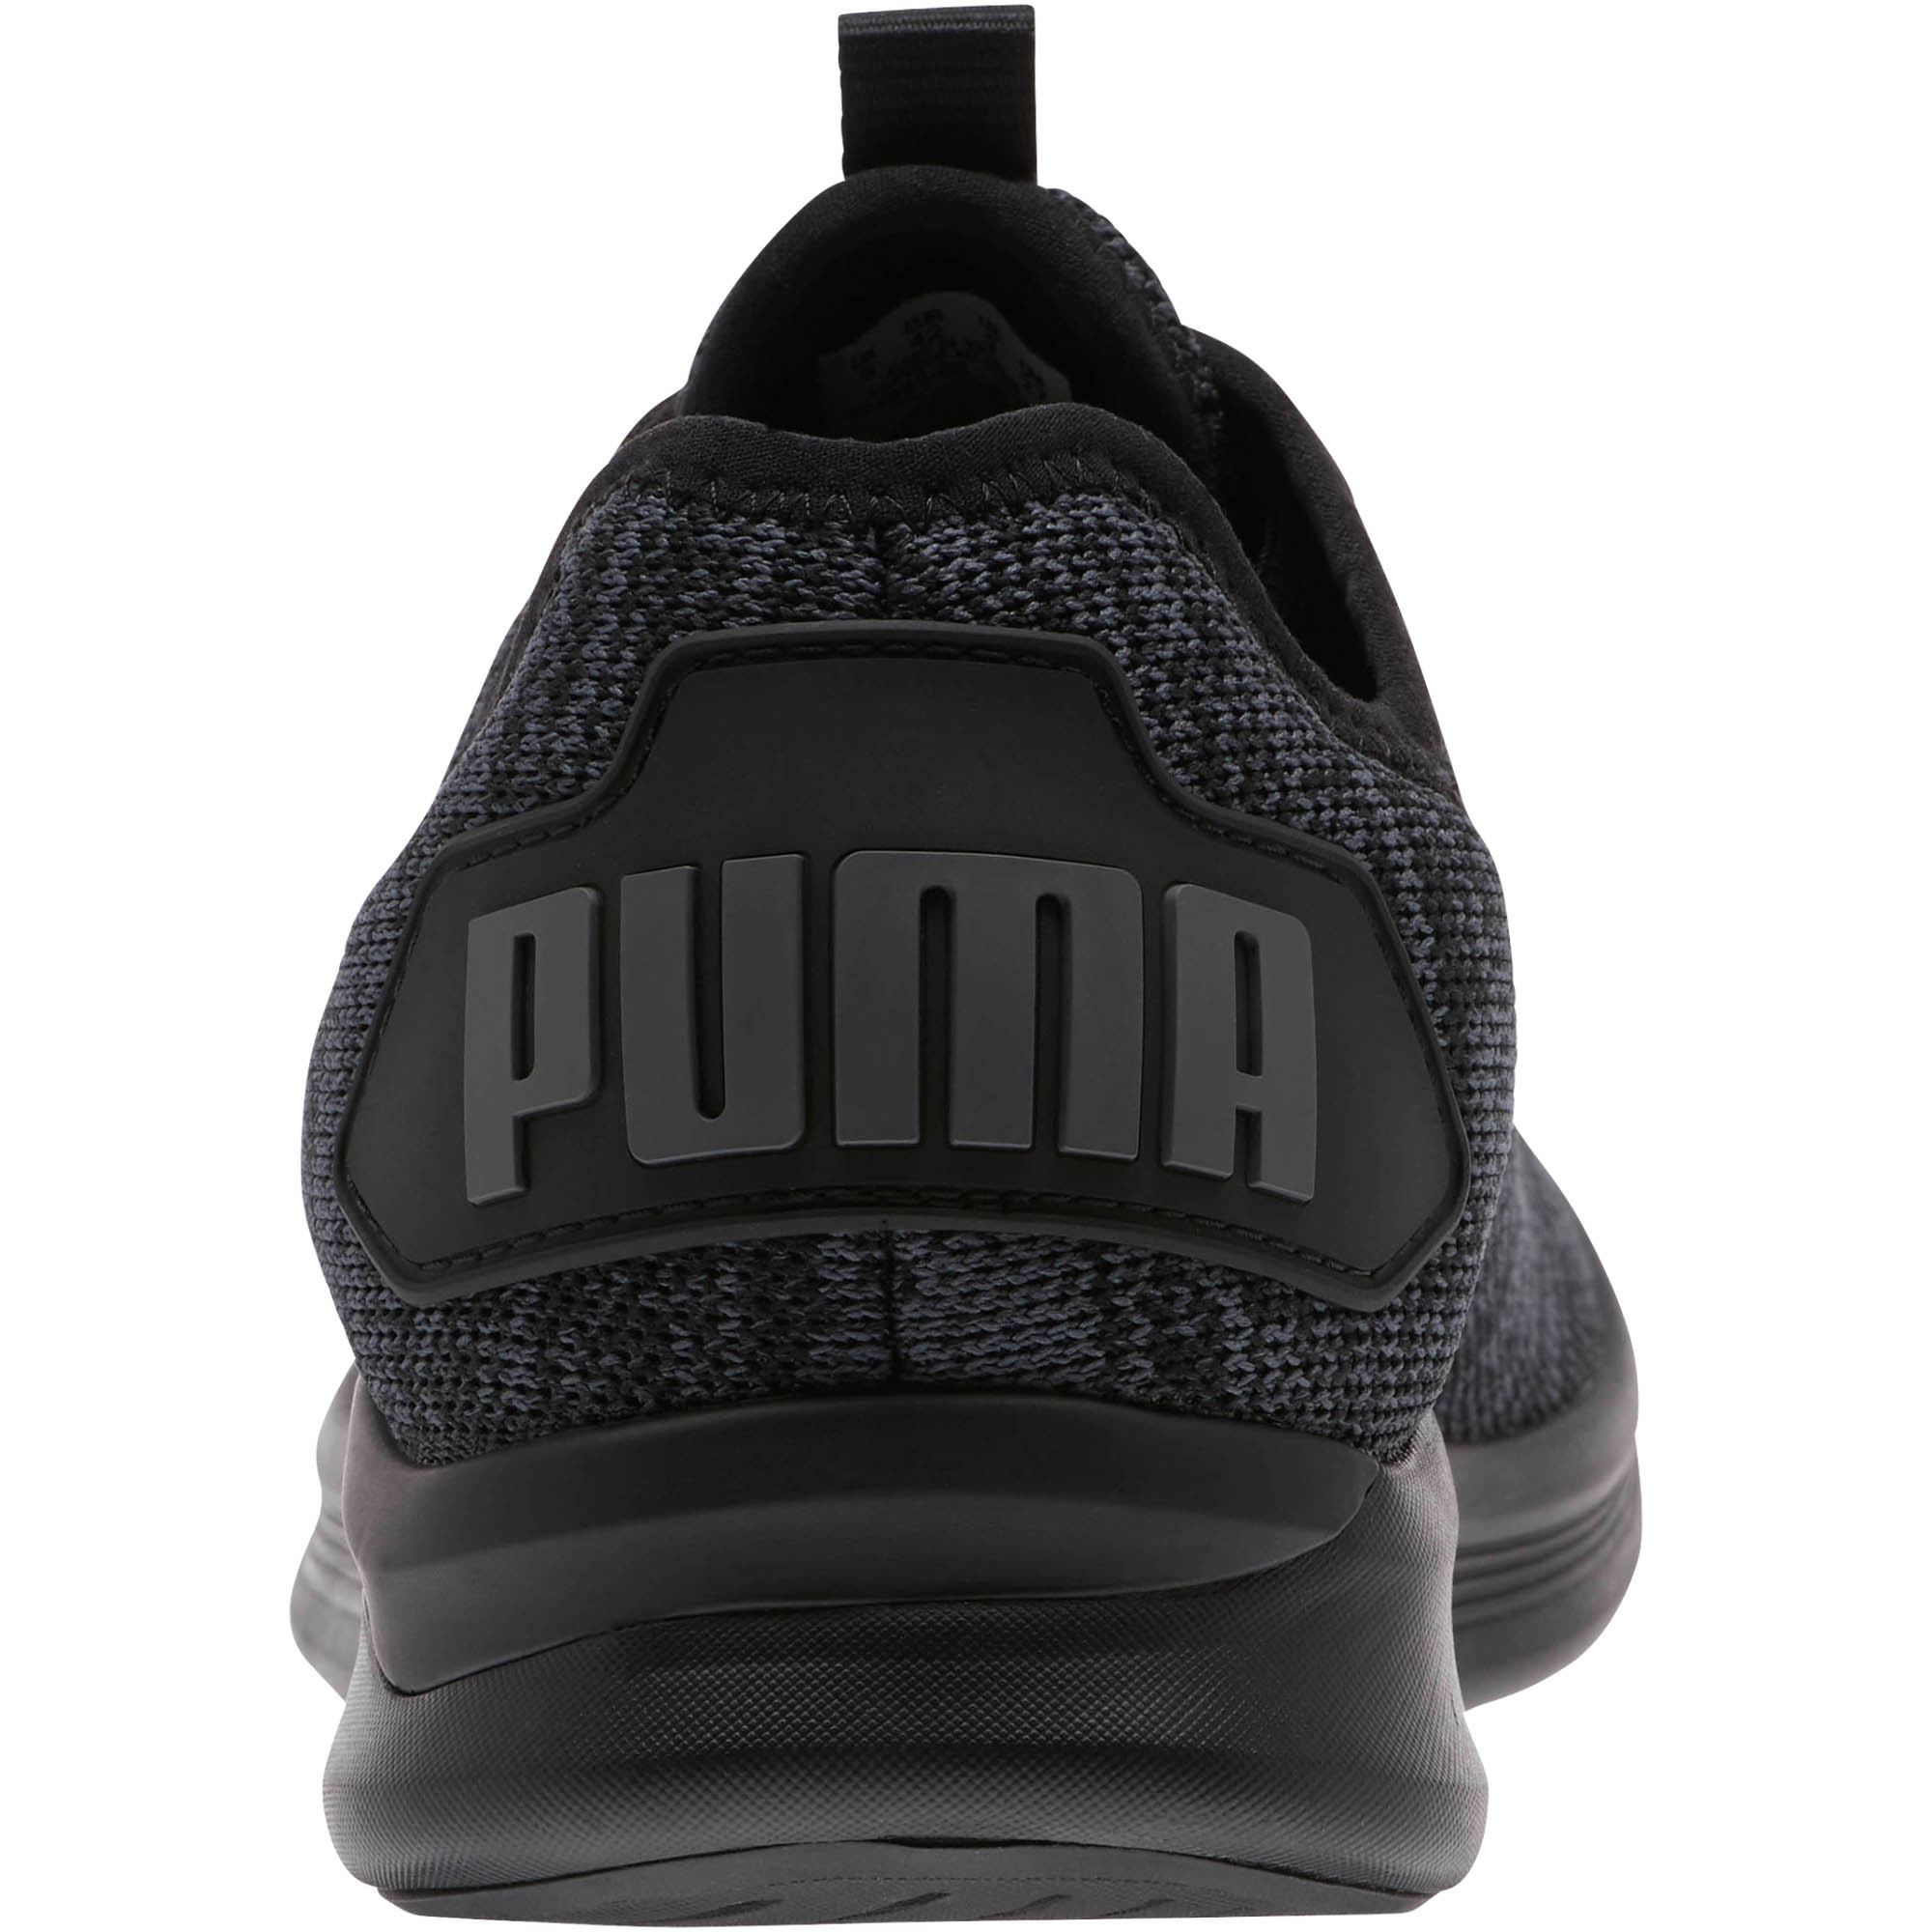 PUMA-Ballast-Men-039-s-Running-Shoes-Men-Shoe-Running thumbnail 15